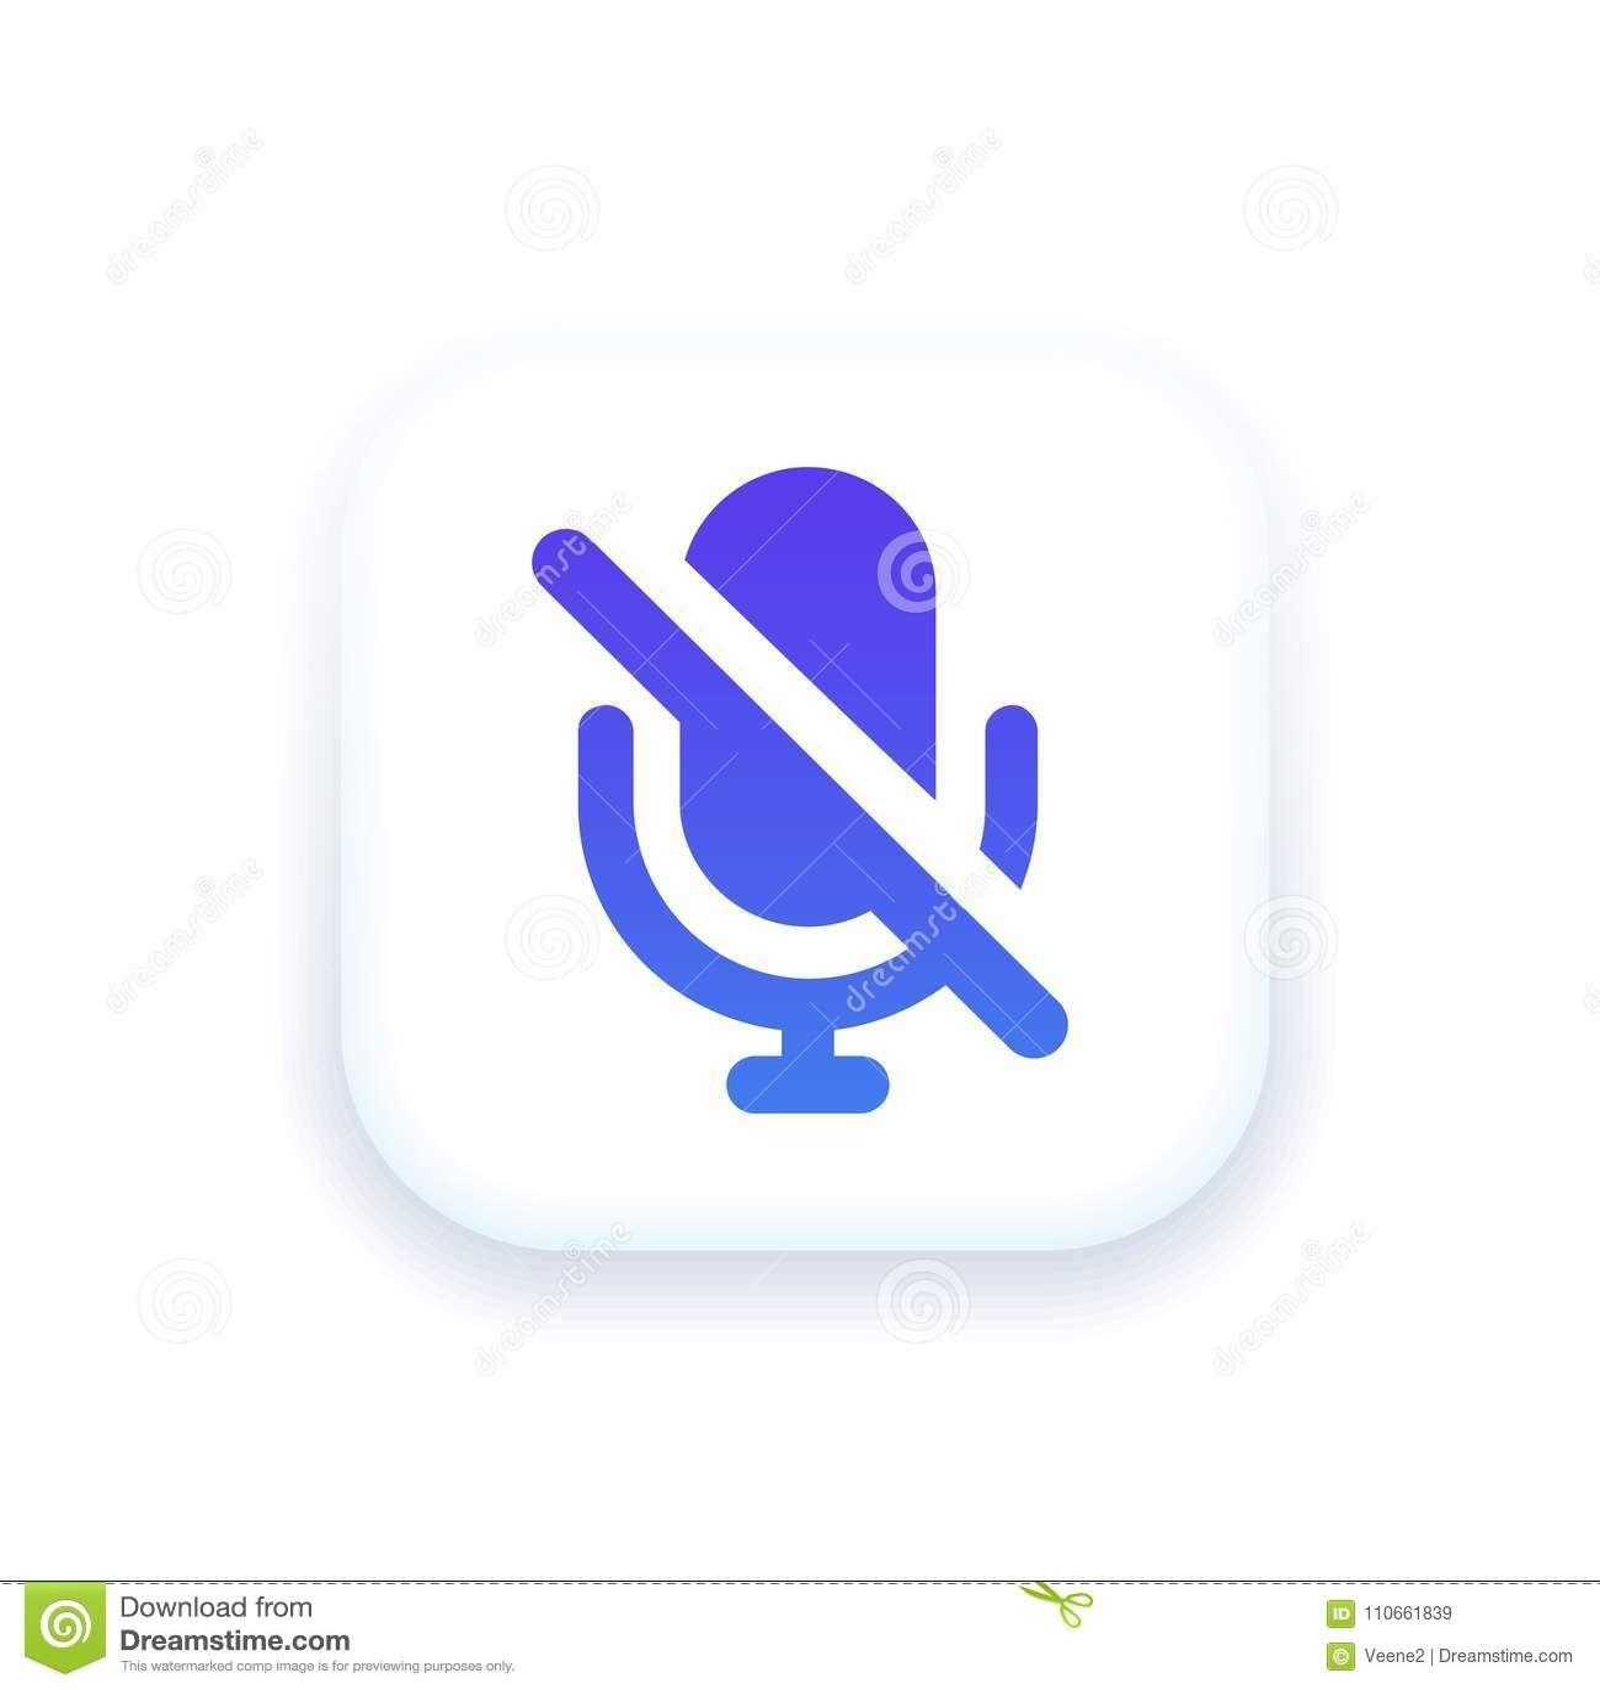 Mute Mic Icon stock illustration. Illustration of vector - 110661839